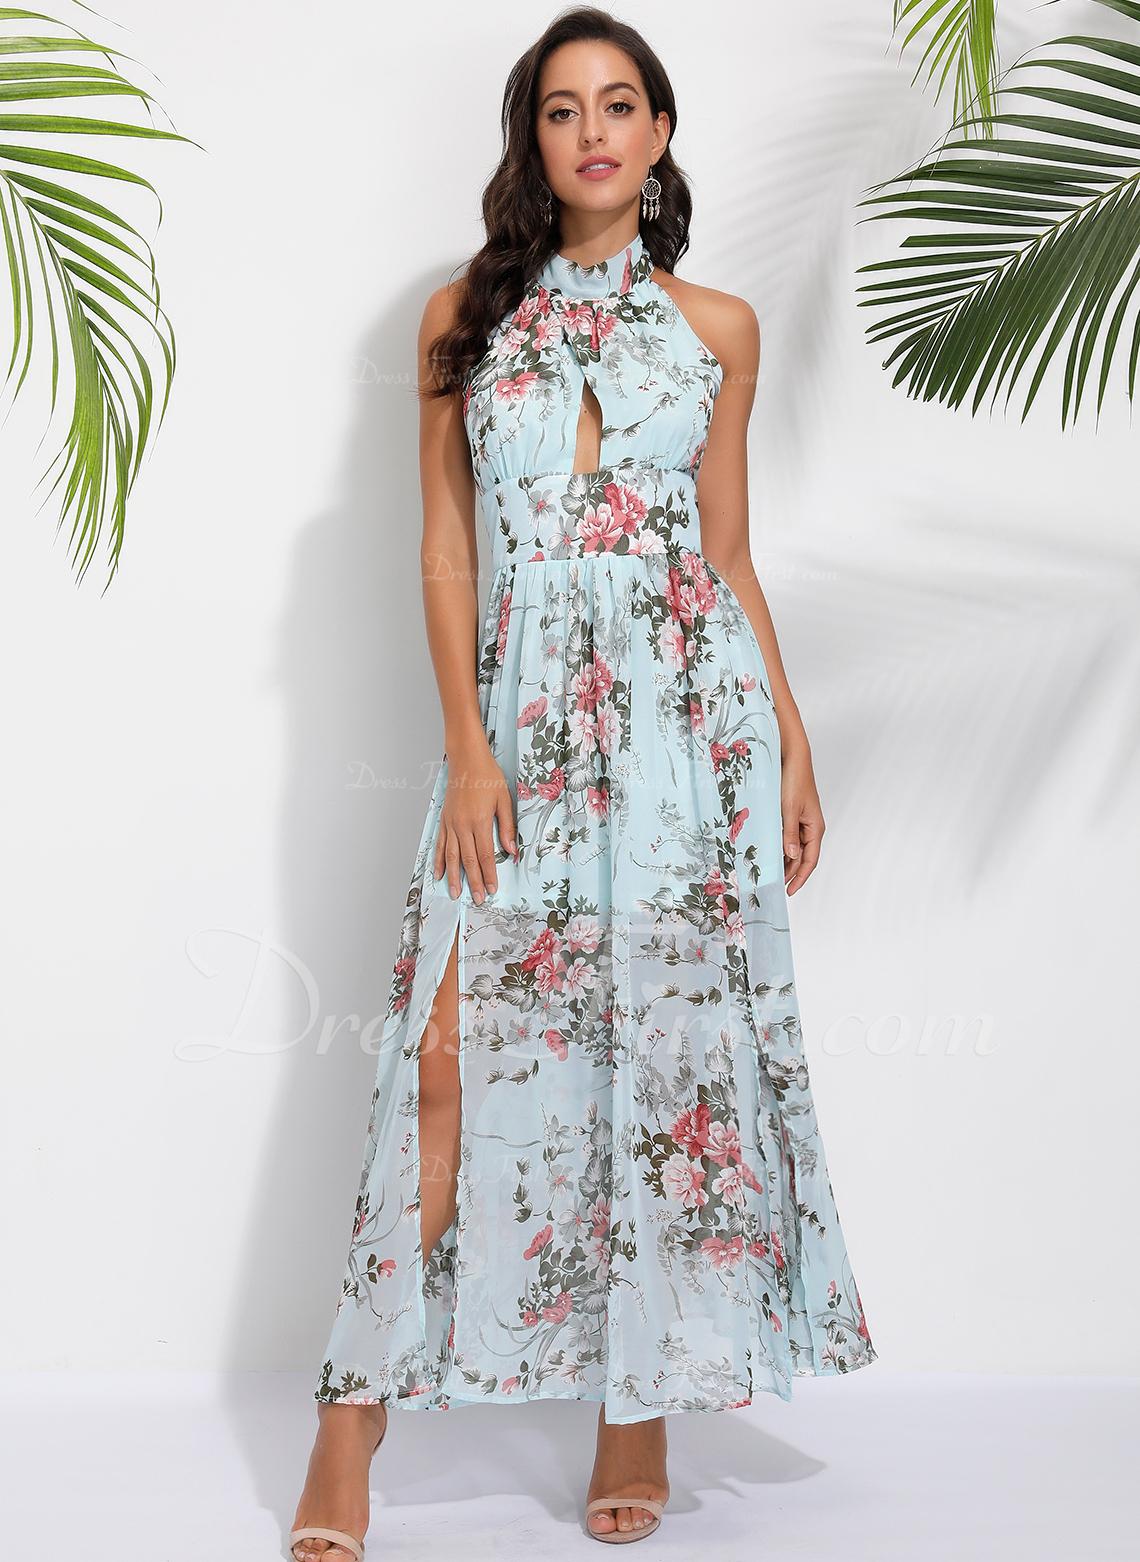 Floral Print Halter Sleeveless Maxi Dresses